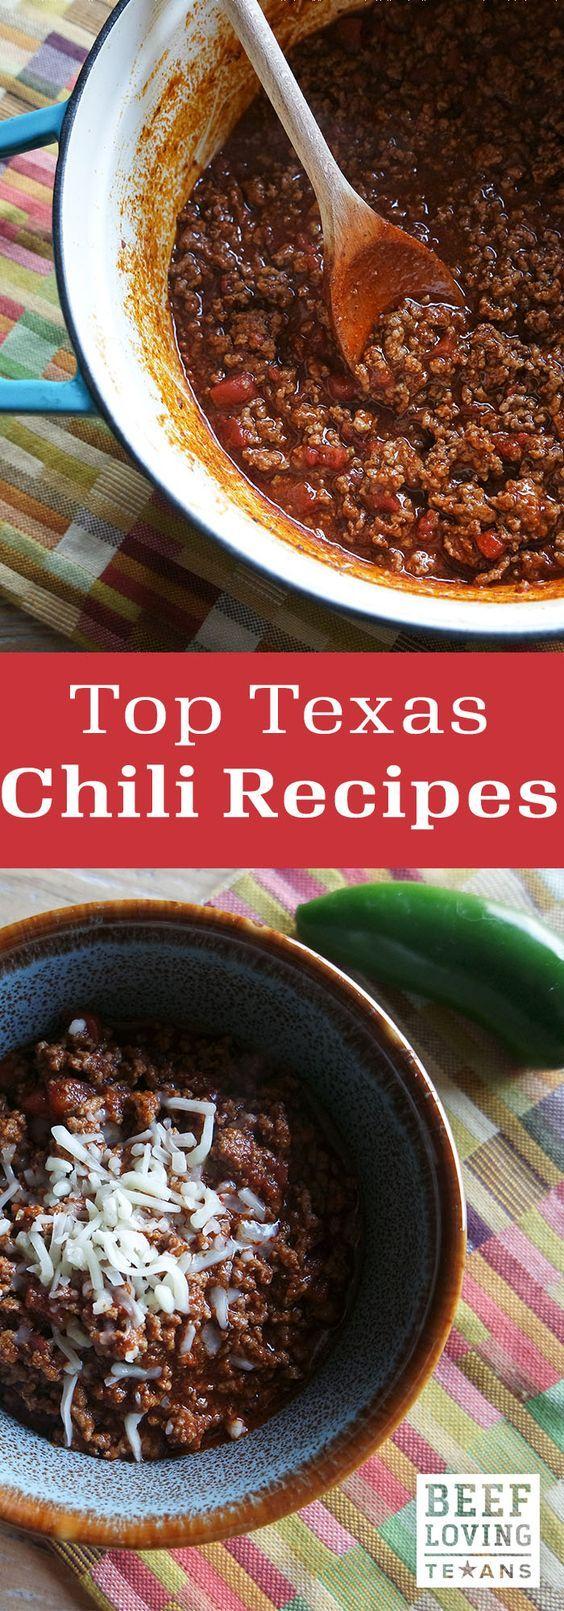 Recipes Easy Beanless Chili